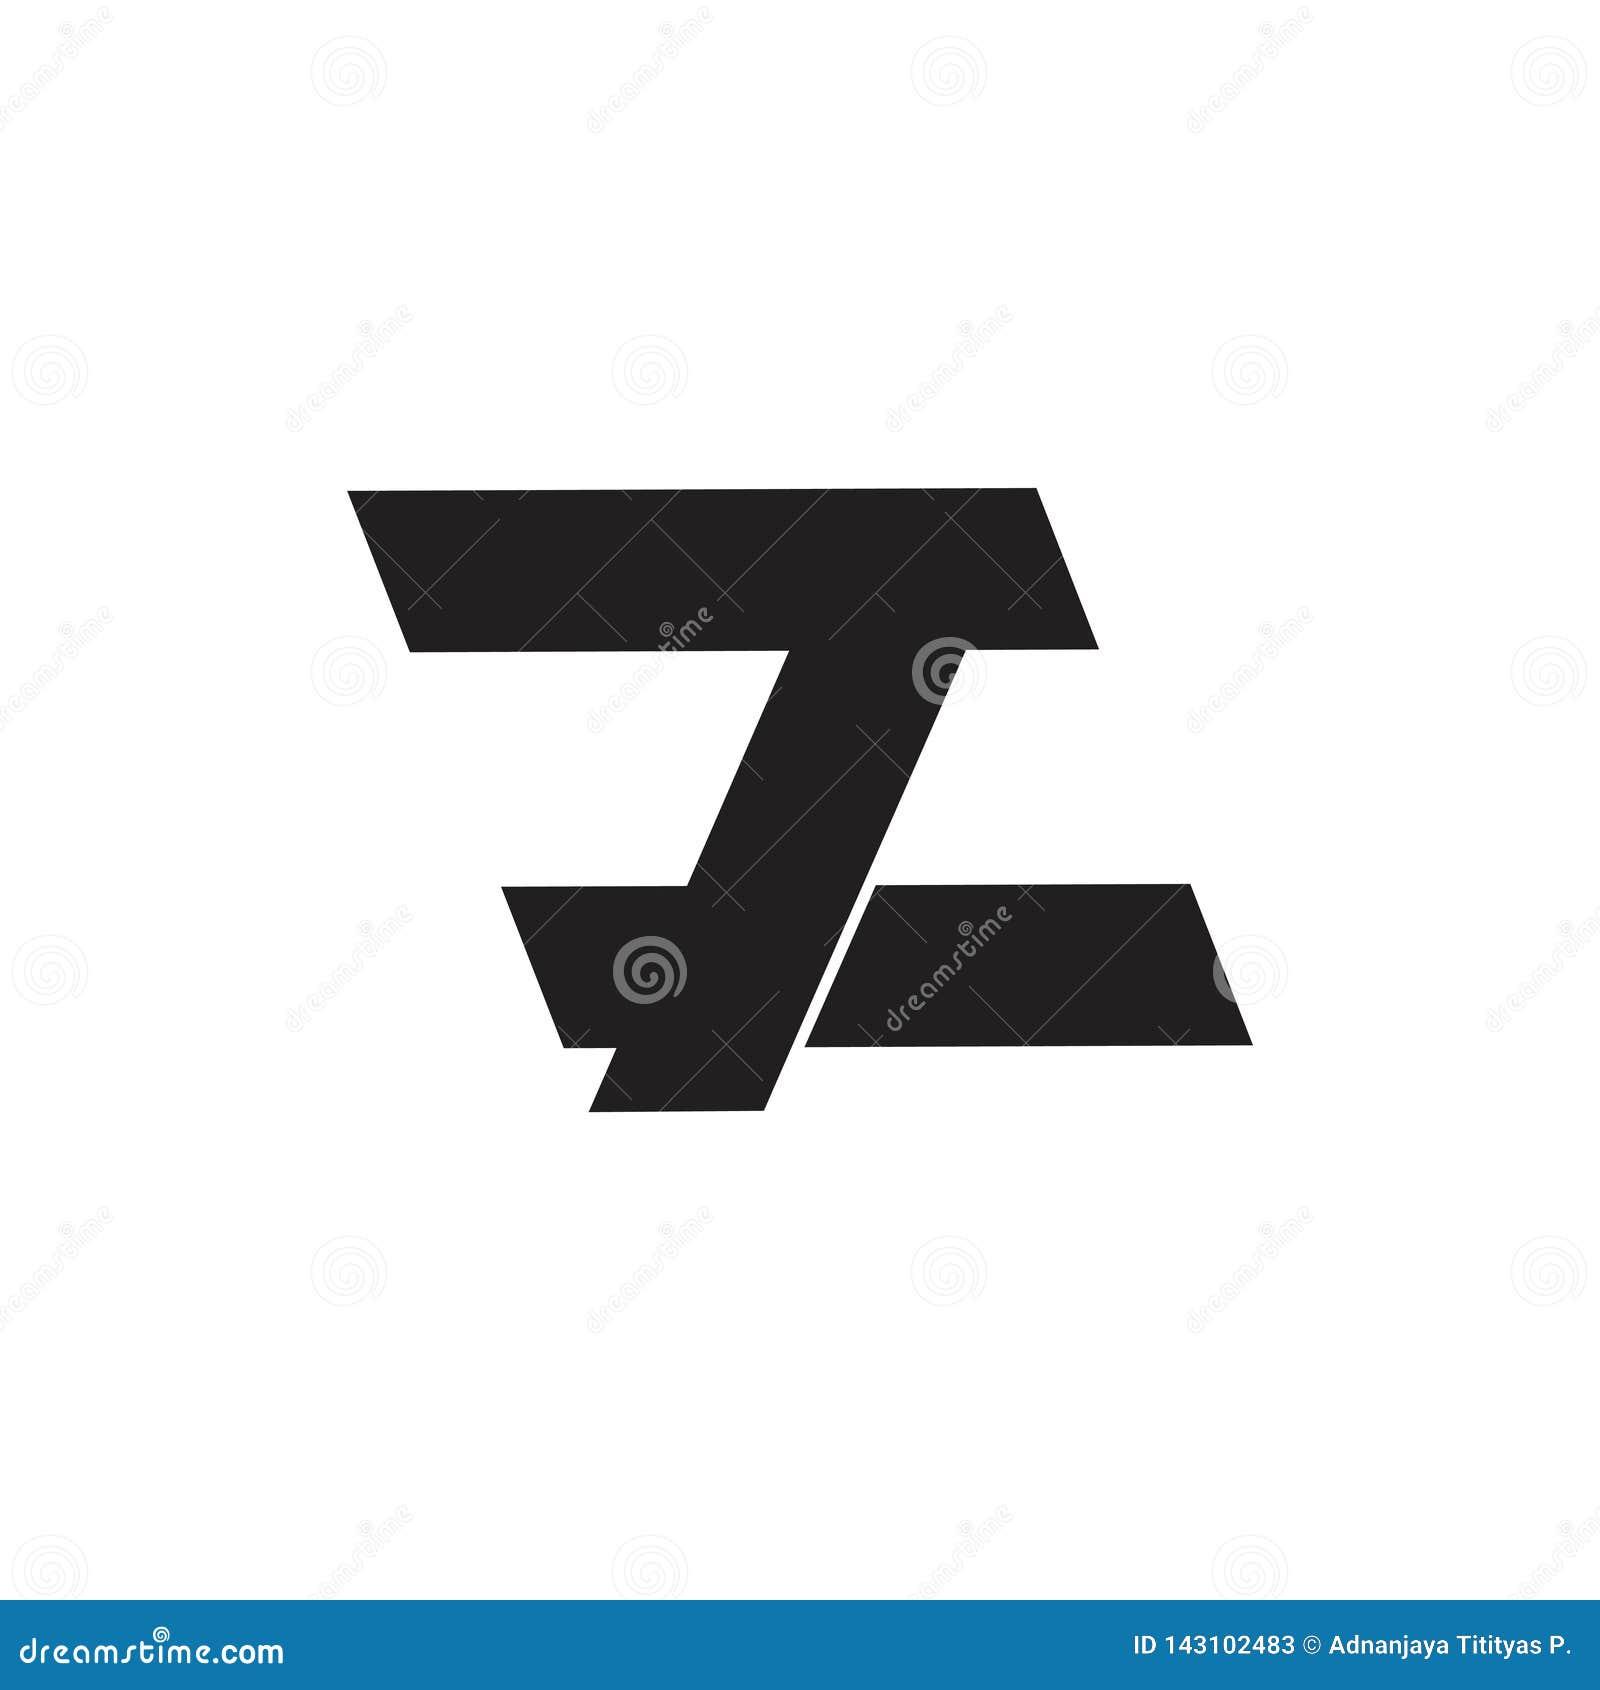 Rotula o vetor geométrico simples do logotipo de 7 z